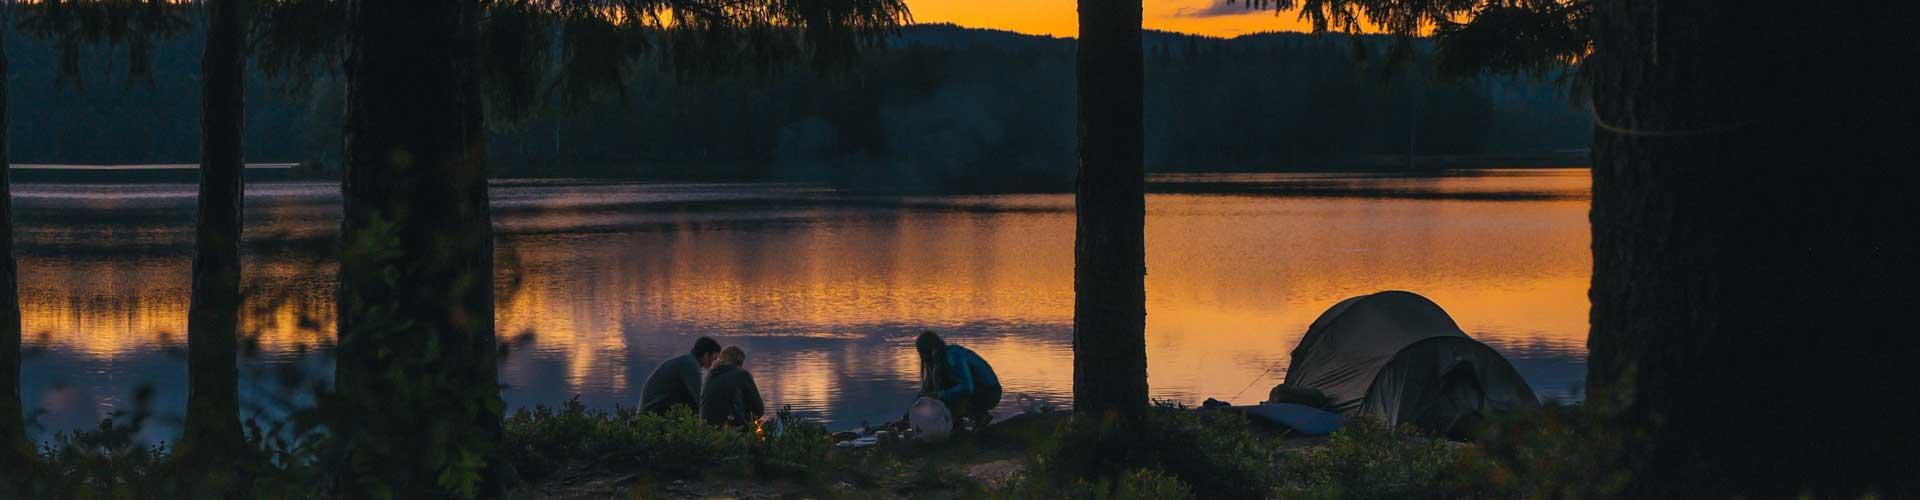 campfire at a Maine summer camp